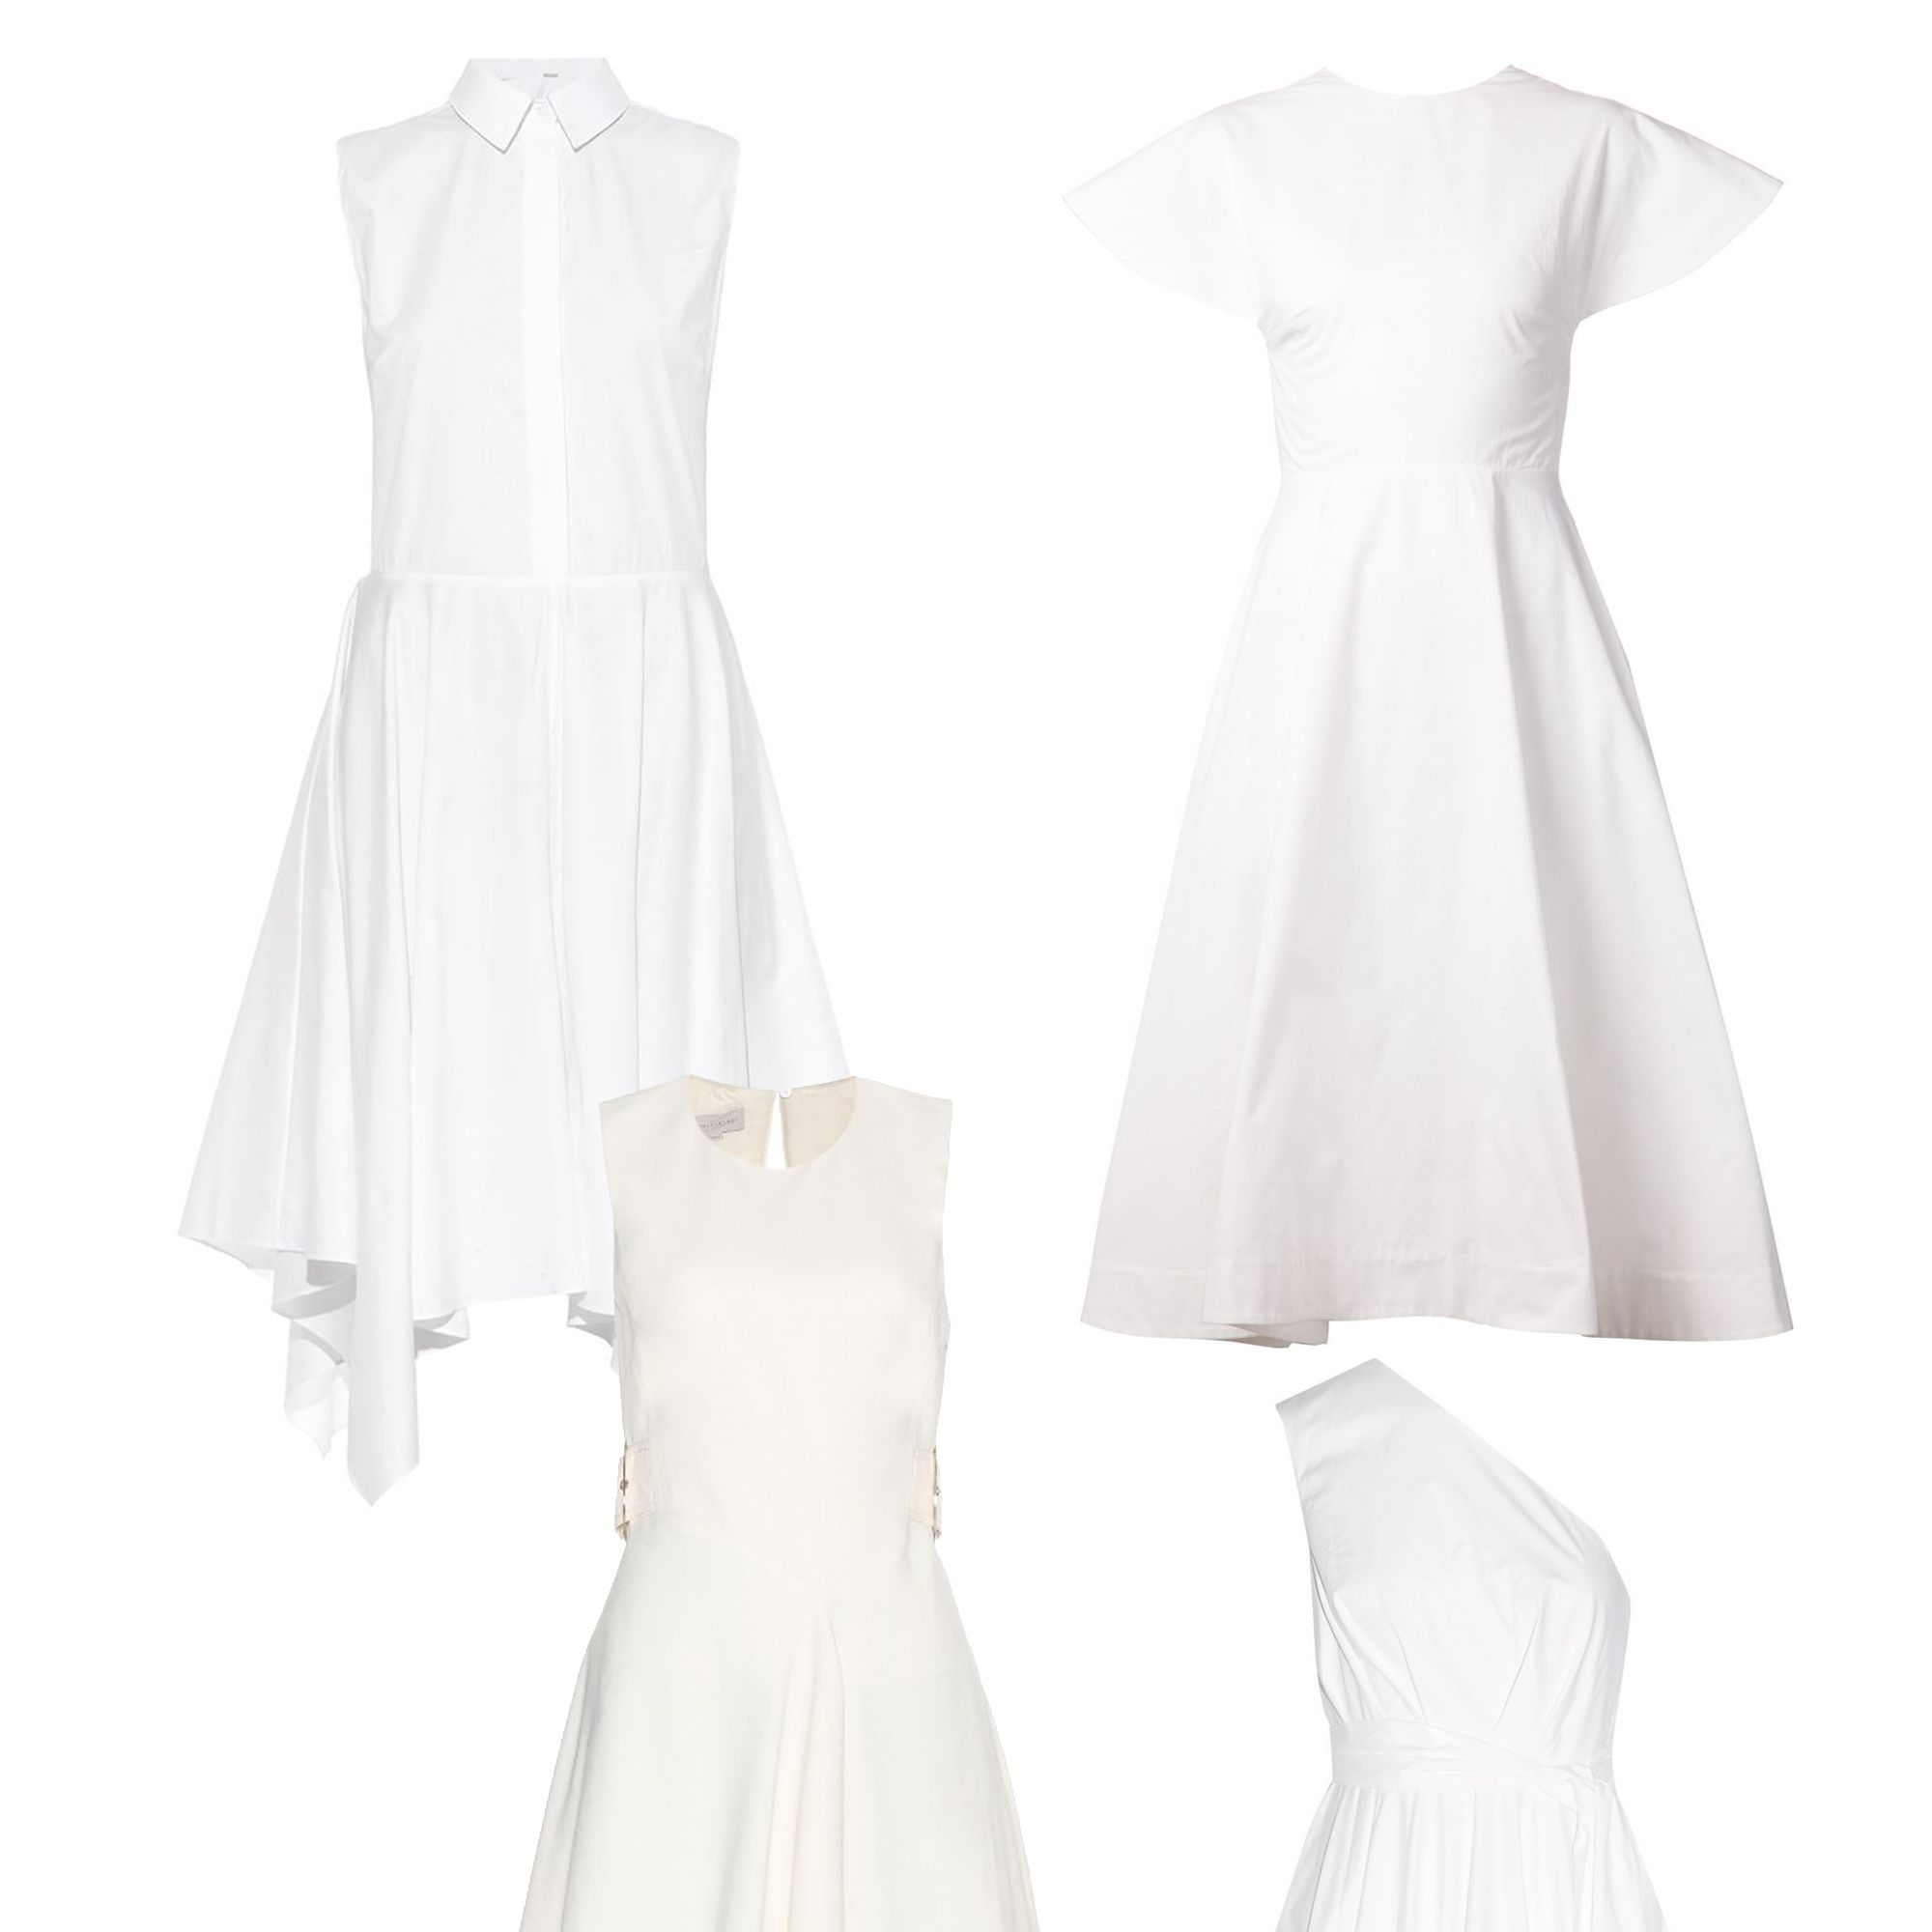 "The little white dress gets a breezy disposition with asymmetrical hemlines and poplin fabrications. <em>Adam Lippes, $890, <a target=""_blank"" href=""http://www.matchesfashion.com/product/1022445"">matchesfashion.com</a>&#x3B; </em><em>Rosie Assoulin, $1,995, <a target=""_blank"" href=""http://www.farfetch.com/shopping/women/rosie-assoulin-backless-flared-dress-item-10900864.aspx?storeid=9218&amp&#x3B;ffref=lp_20_"">farfetch.com</a>&#x3B; </em><em>Stella McCartney, $1,380, <a target=""_blank"" href=""http://www.mytheresa.com/en-us/crepe-dress-417230.html"">mytheresa.com</a>&#x3B; </em><em>Tibi, $625, <a target=""_blank"" href=""http://www.net-a-porter.com/product/536399/Tibi/one-shoulder-cotton-poplin-dress"">net-a-porter.com</a></em>"